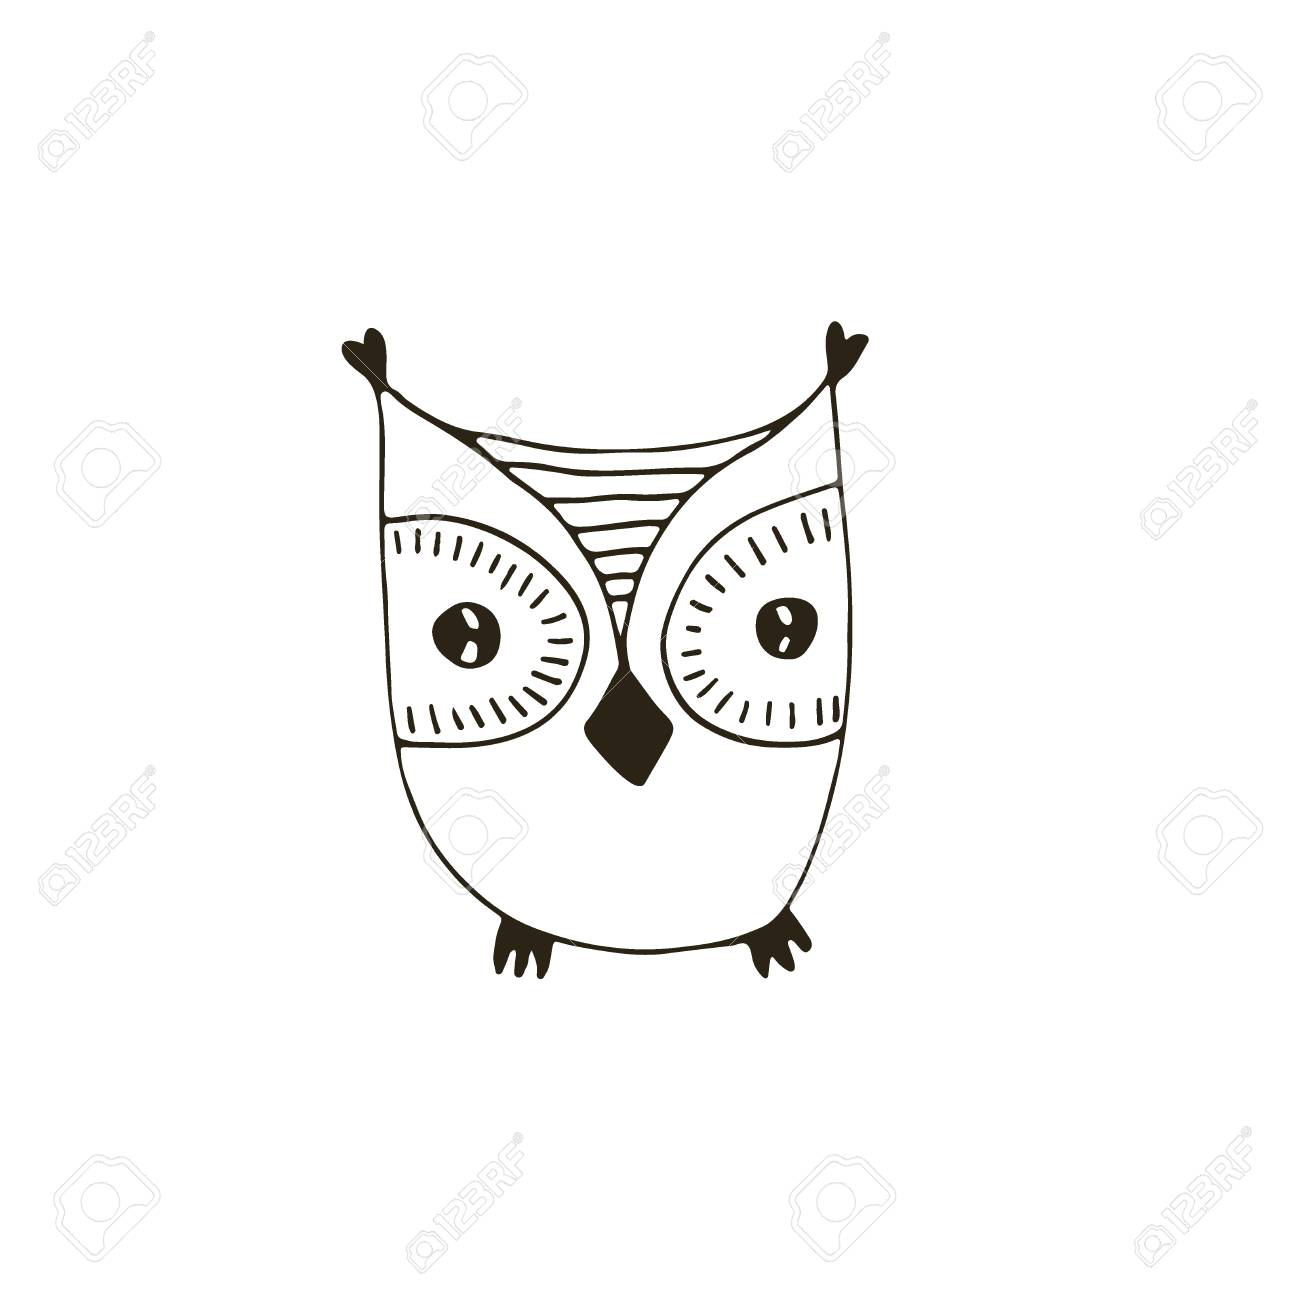 Bird Print Design Coloring Book Page Stock Vector